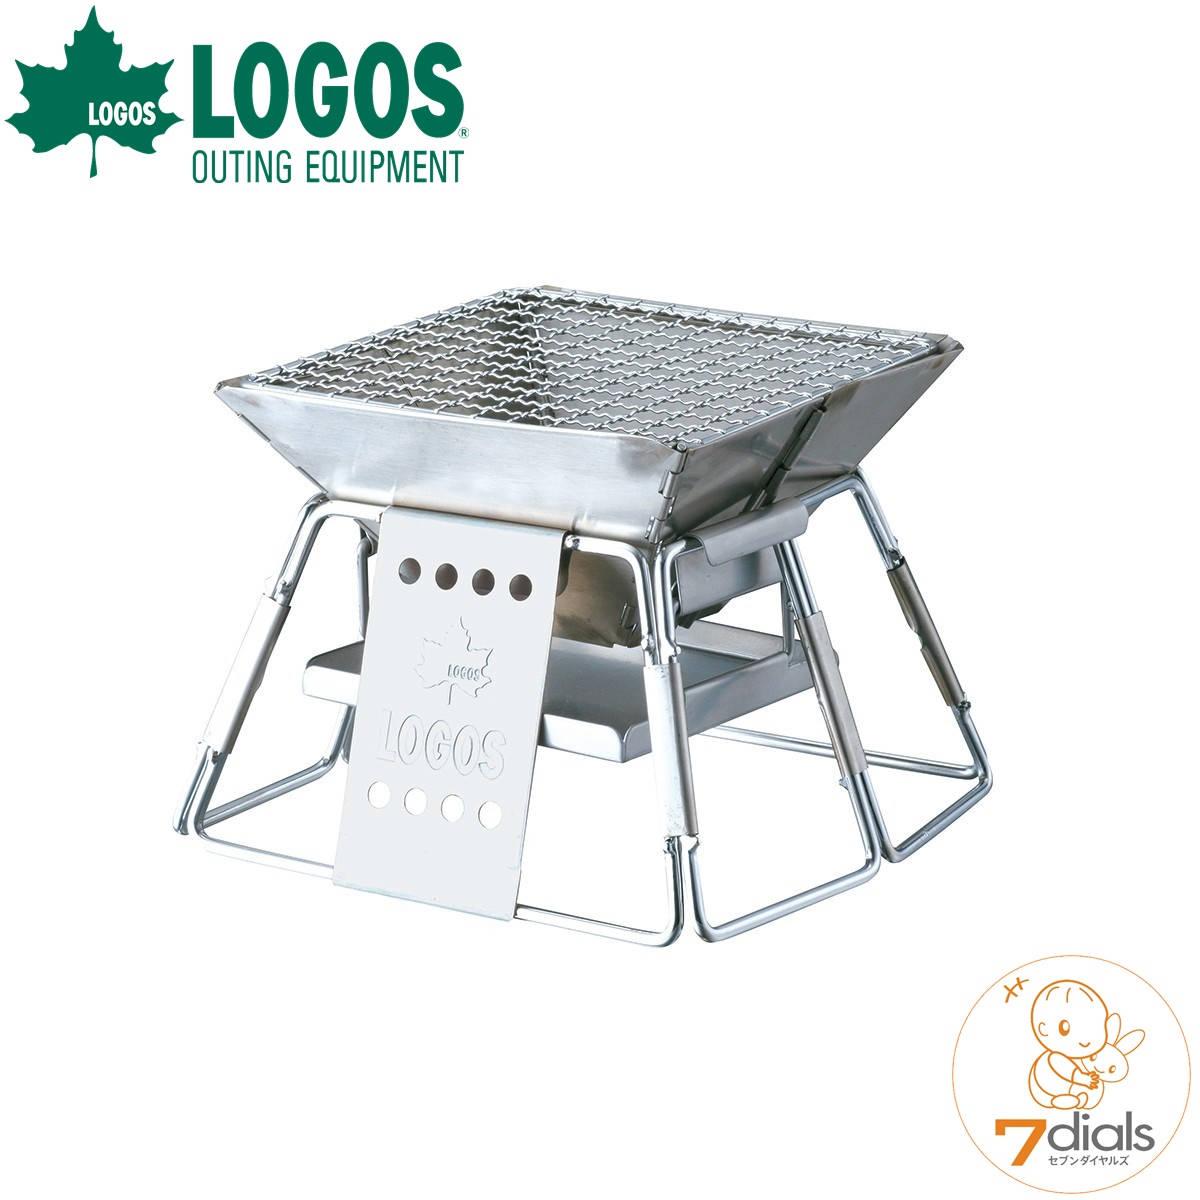 LOGOS/ロゴス ピラミッドグリル・コンパクト 卓上で炭火焼きが楽しめるロゴスのピラミッドグリル ソロキャンプでも役立つ焚火台としてもOK BBGコンロ バーベキューコンロ キャンプ